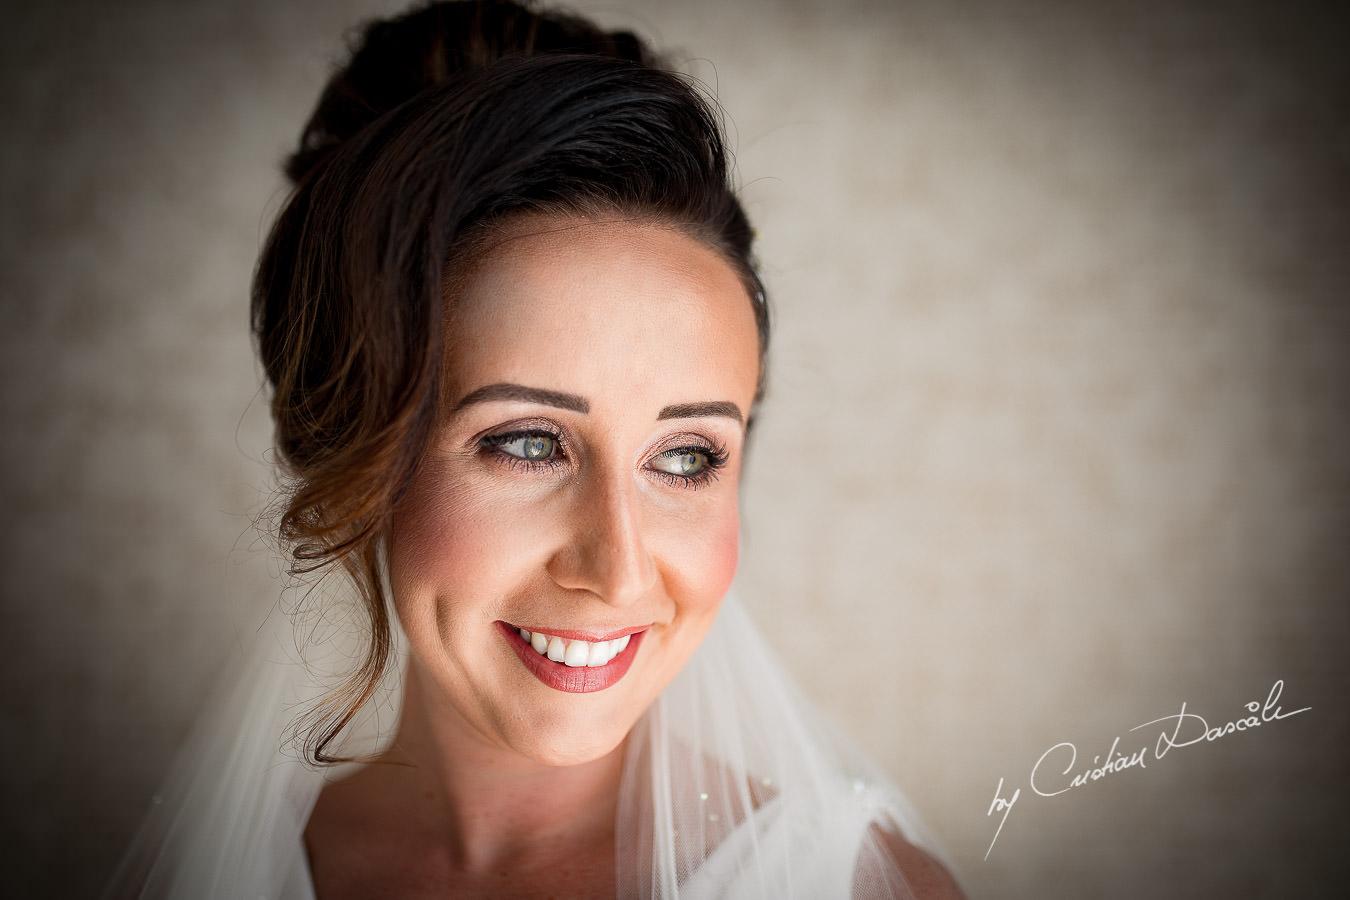 Lovely bridal portrait captured by Cristian Dascalu during an elegant Aphrodite Hills Wedding in Cyprus.